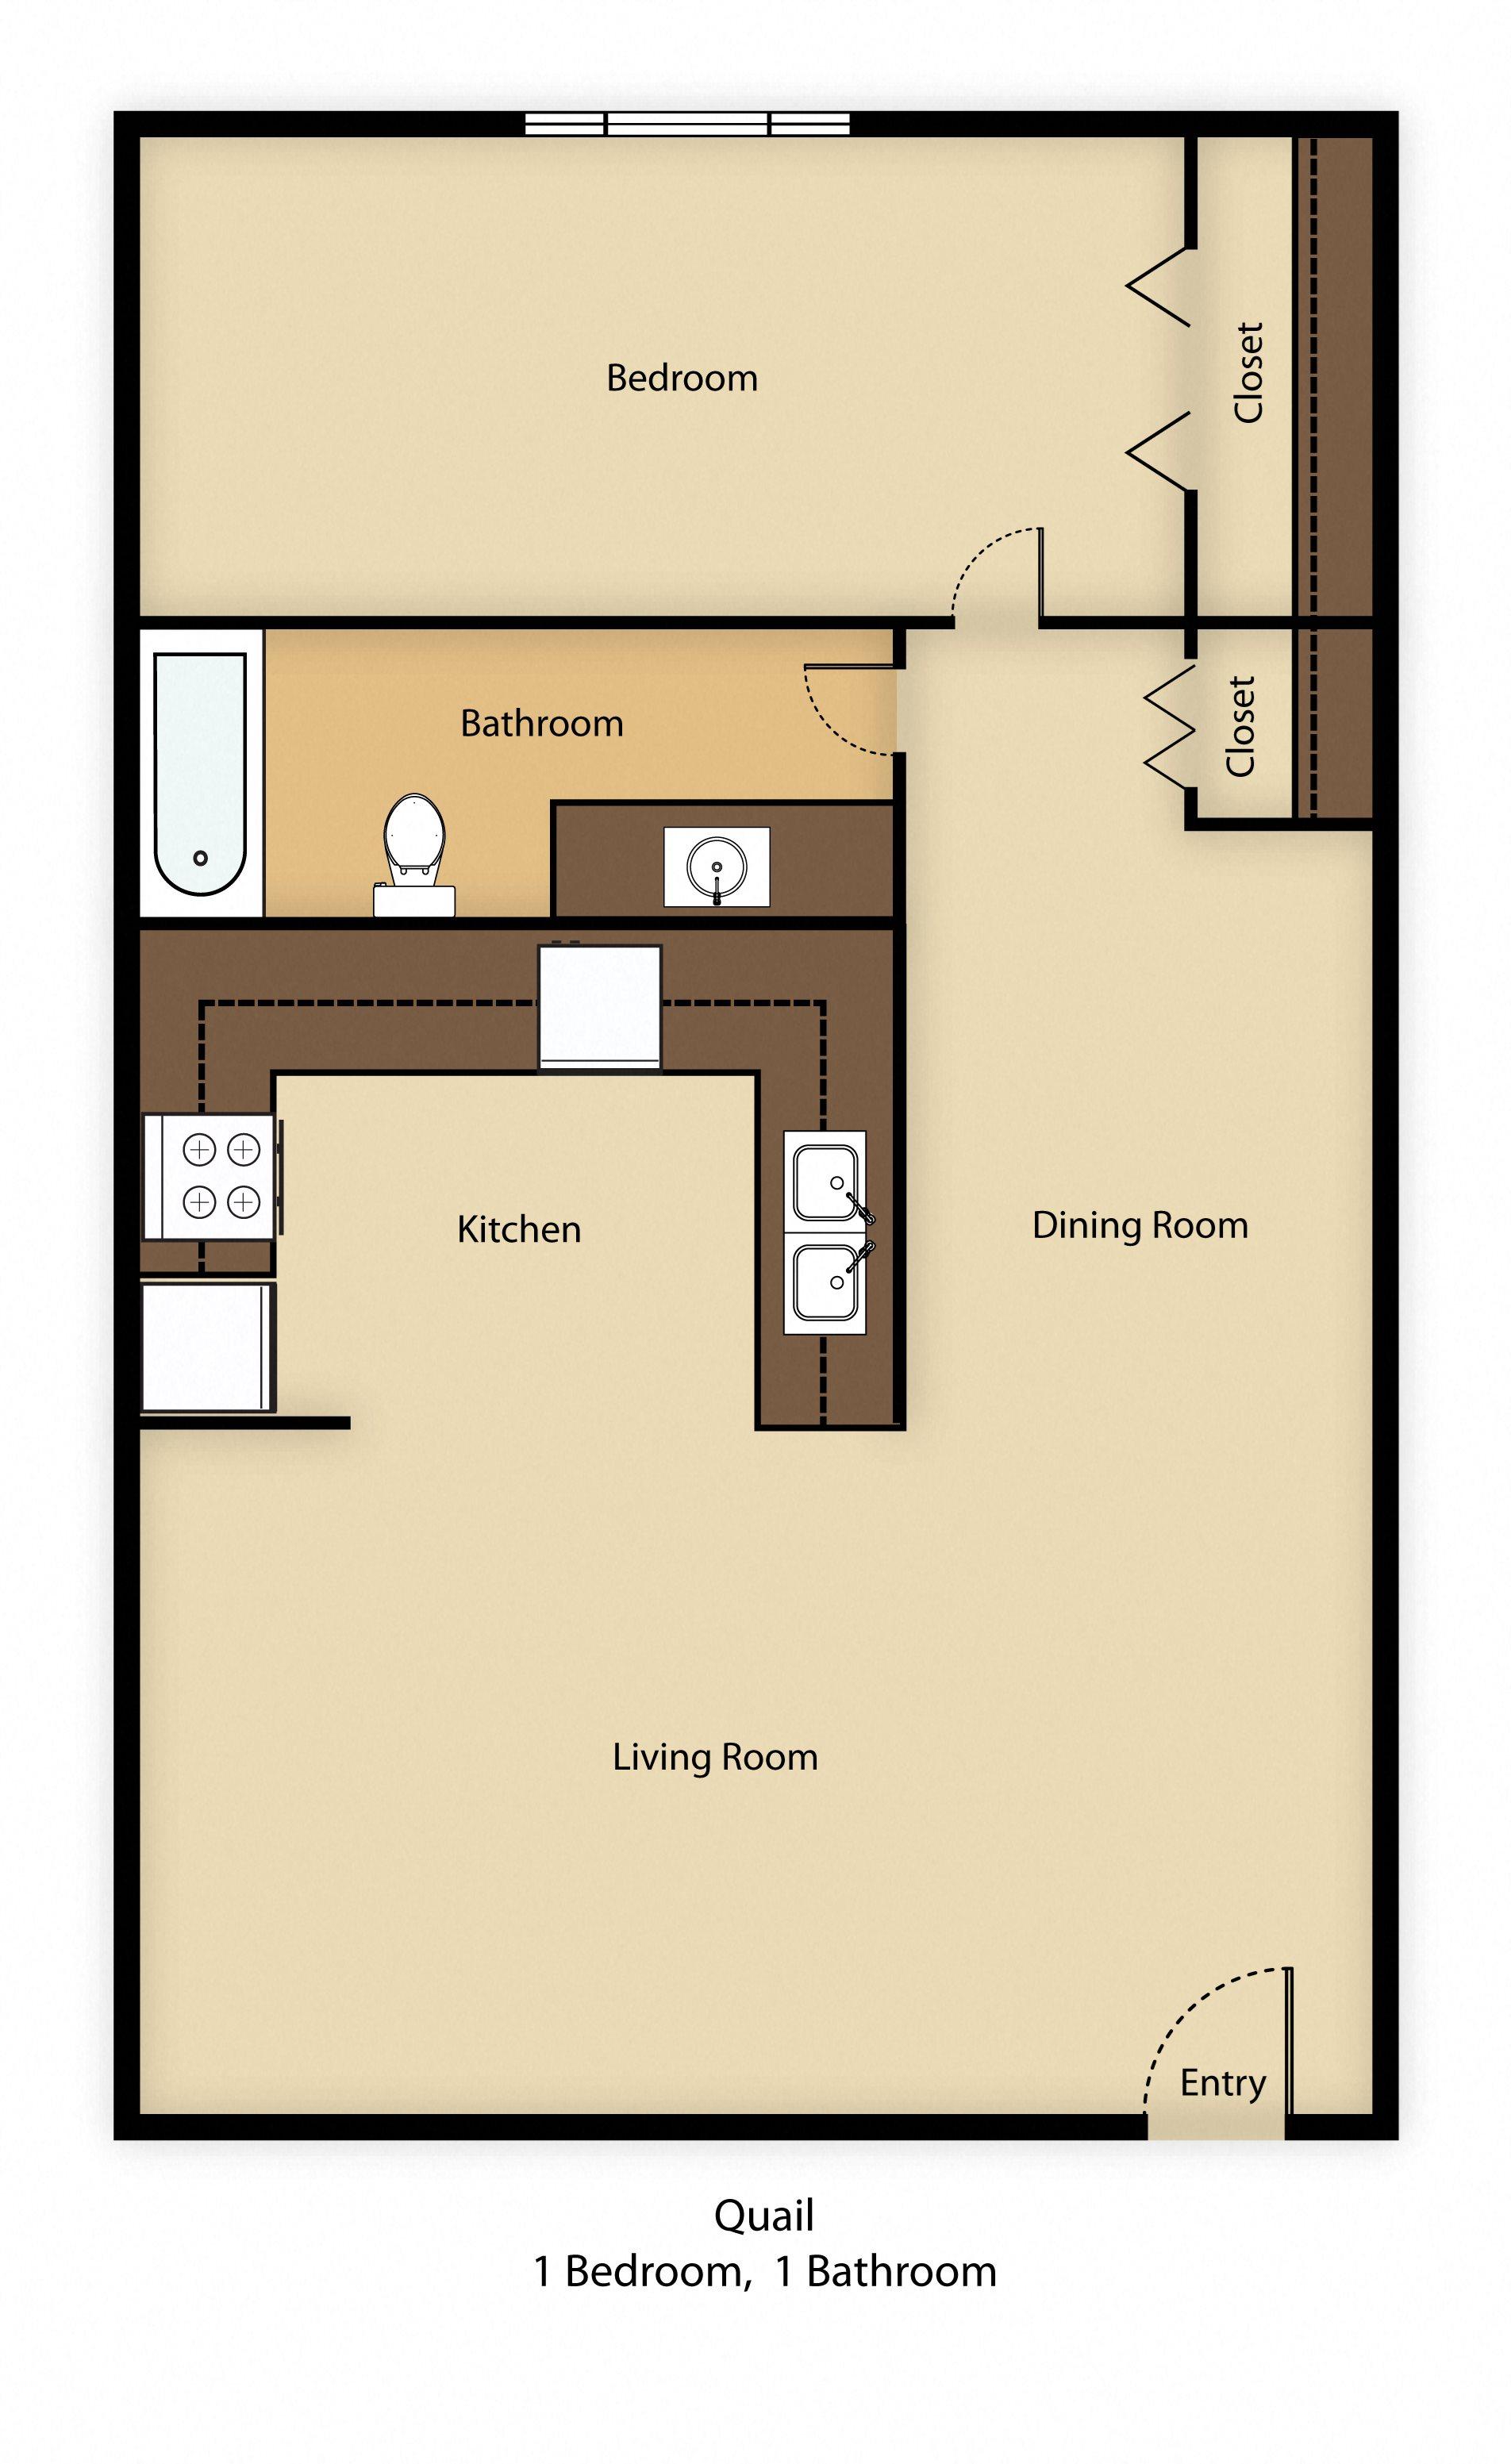 Quail Floor Plan 1